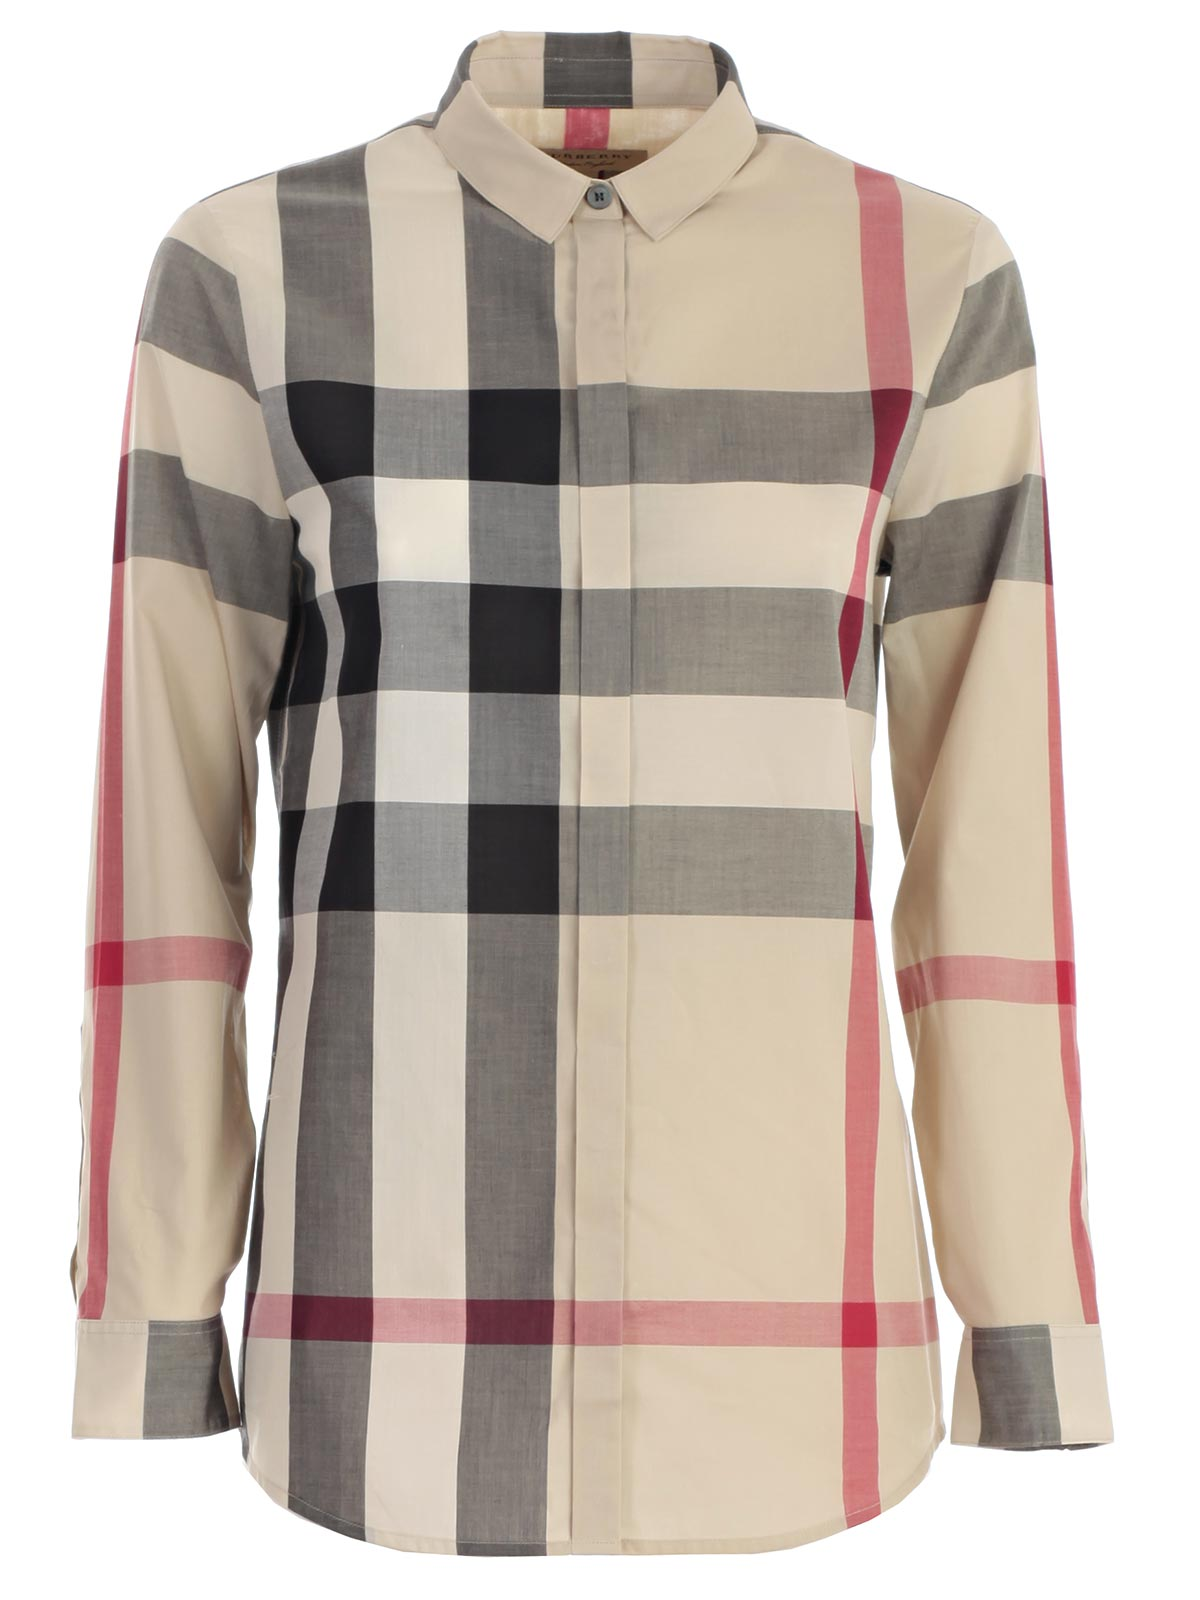 burberry shirts 3994090 2720c new classic check